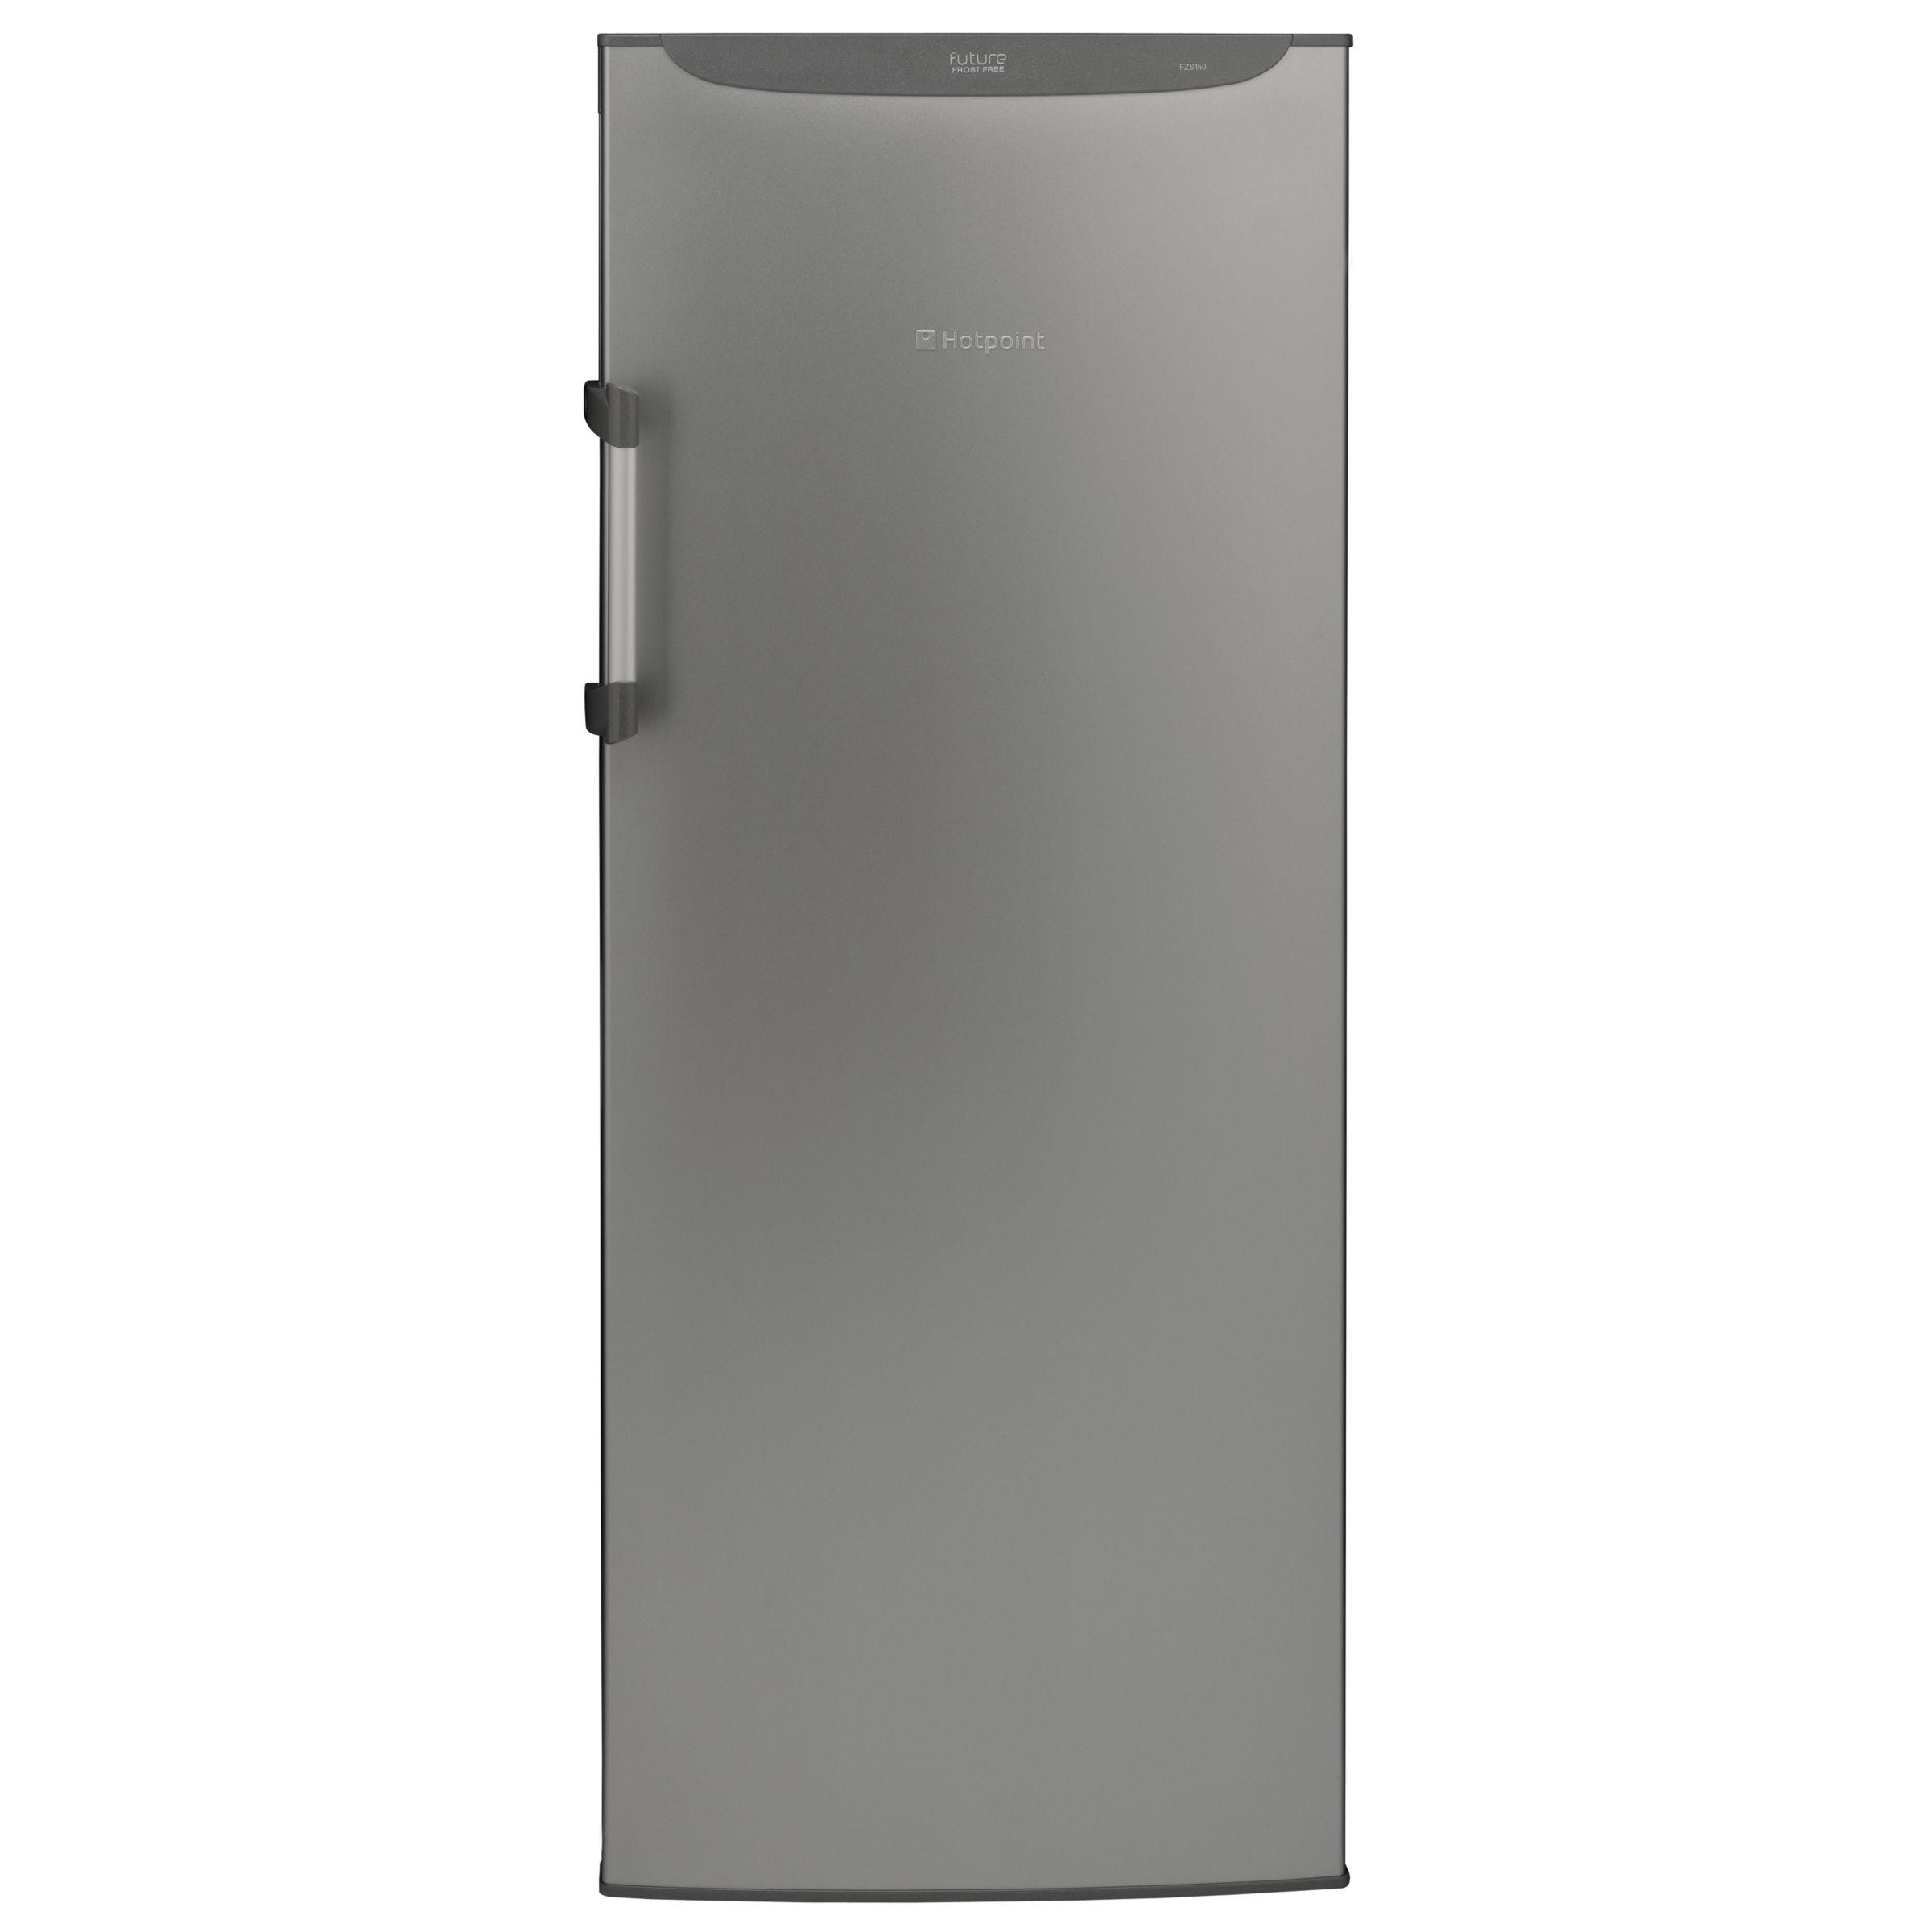 Hotpoint FZS150G Freezer, Graphite at John Lewis